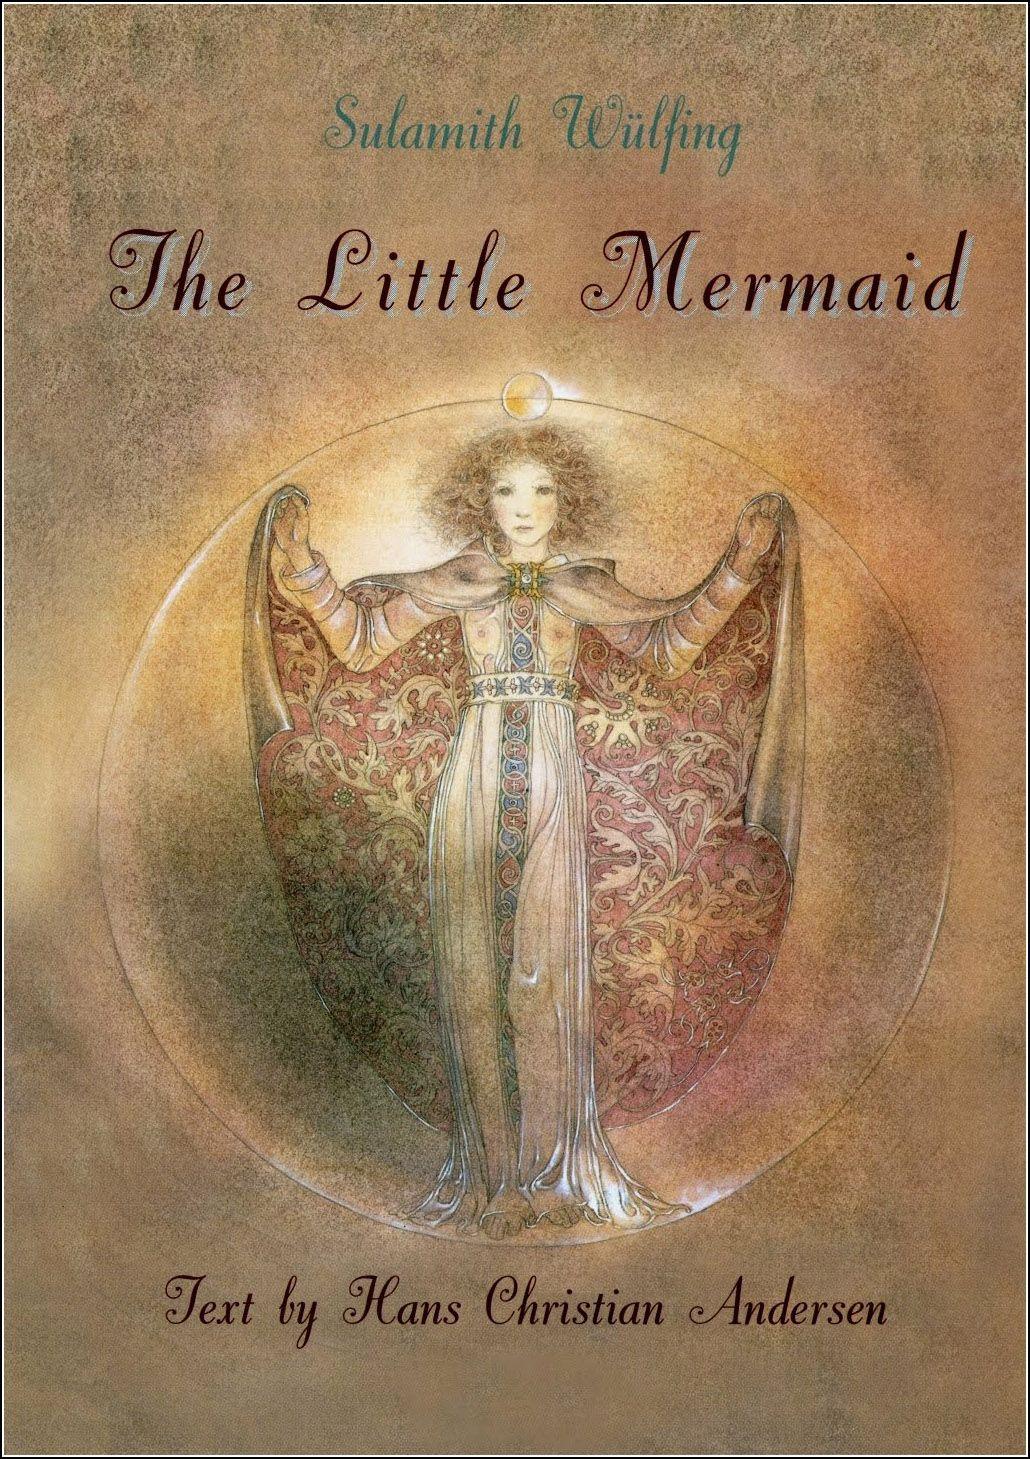 Hans Christian Andersen The Little Mermaid Die Kleine Seejungfrau Wuppertal Elberfeld 1953 Illu The Little Mermaid Fairytale Illustration Vintage Book Art